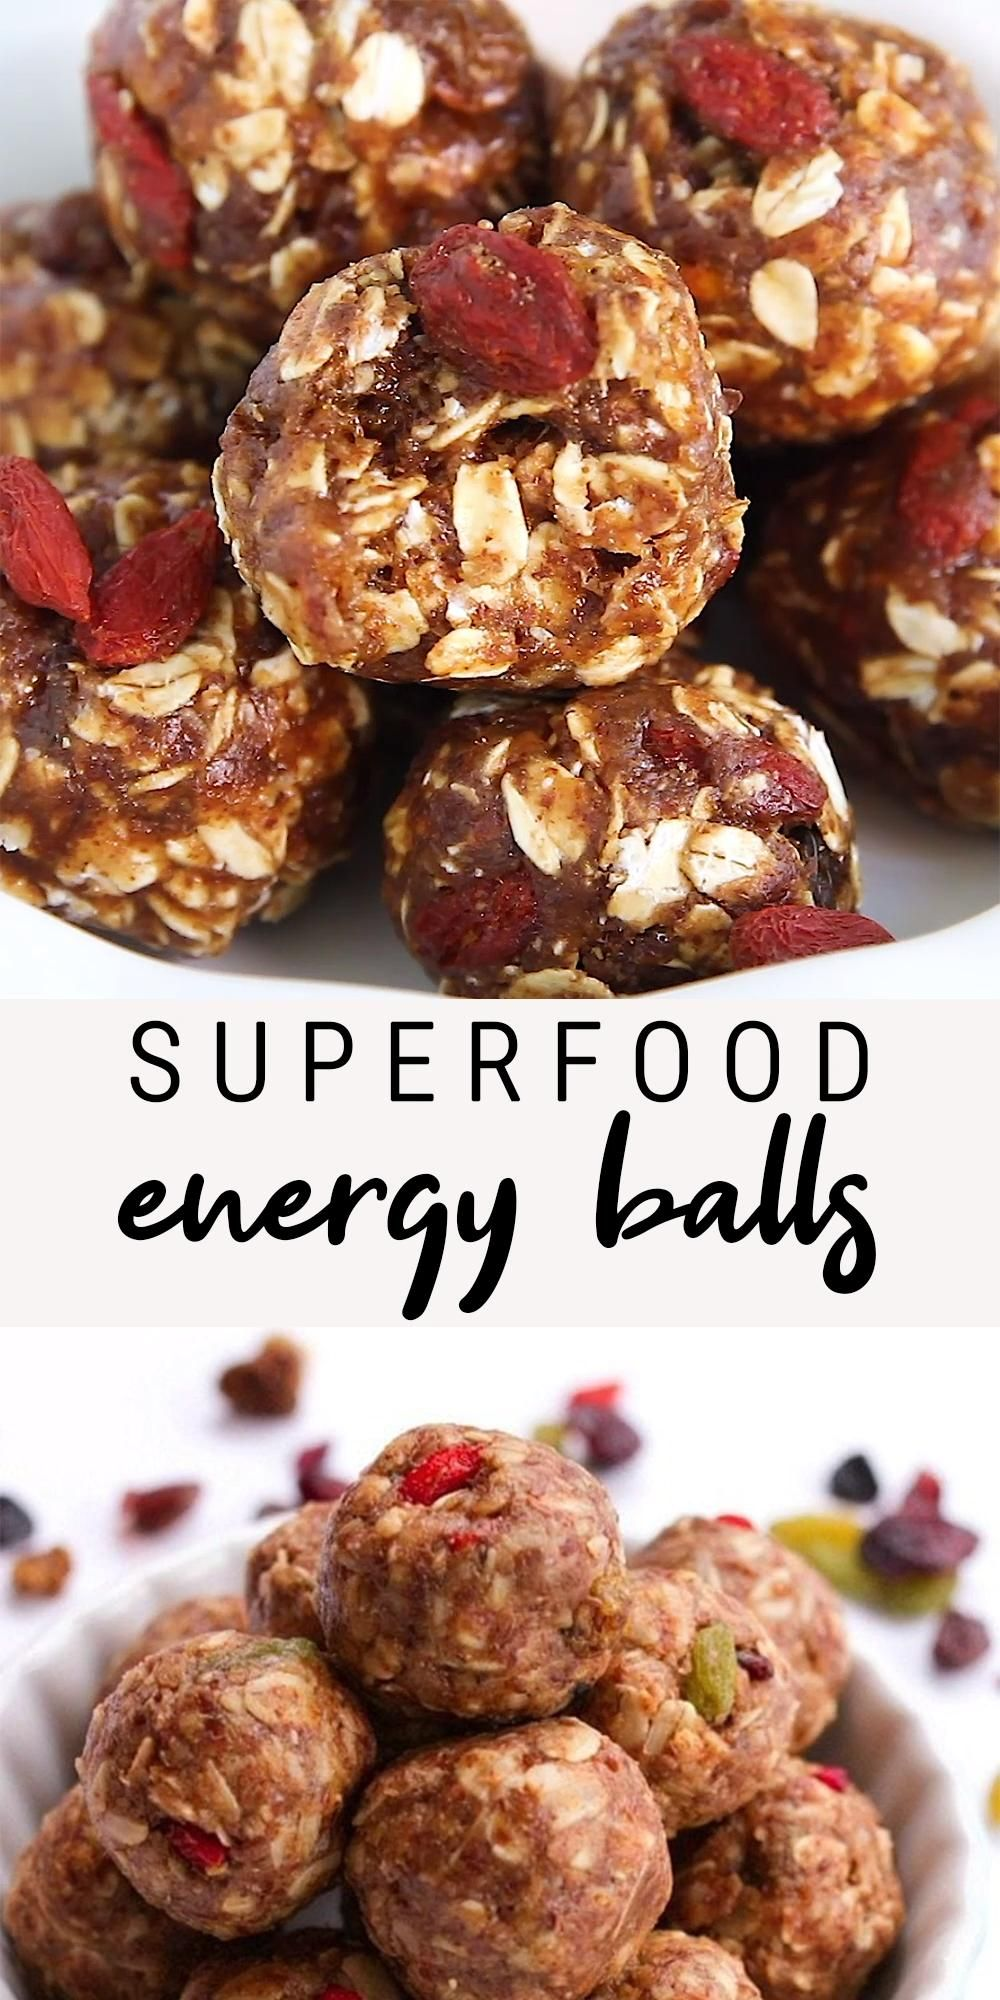 No Bake Healthy Superfood Energy Balls